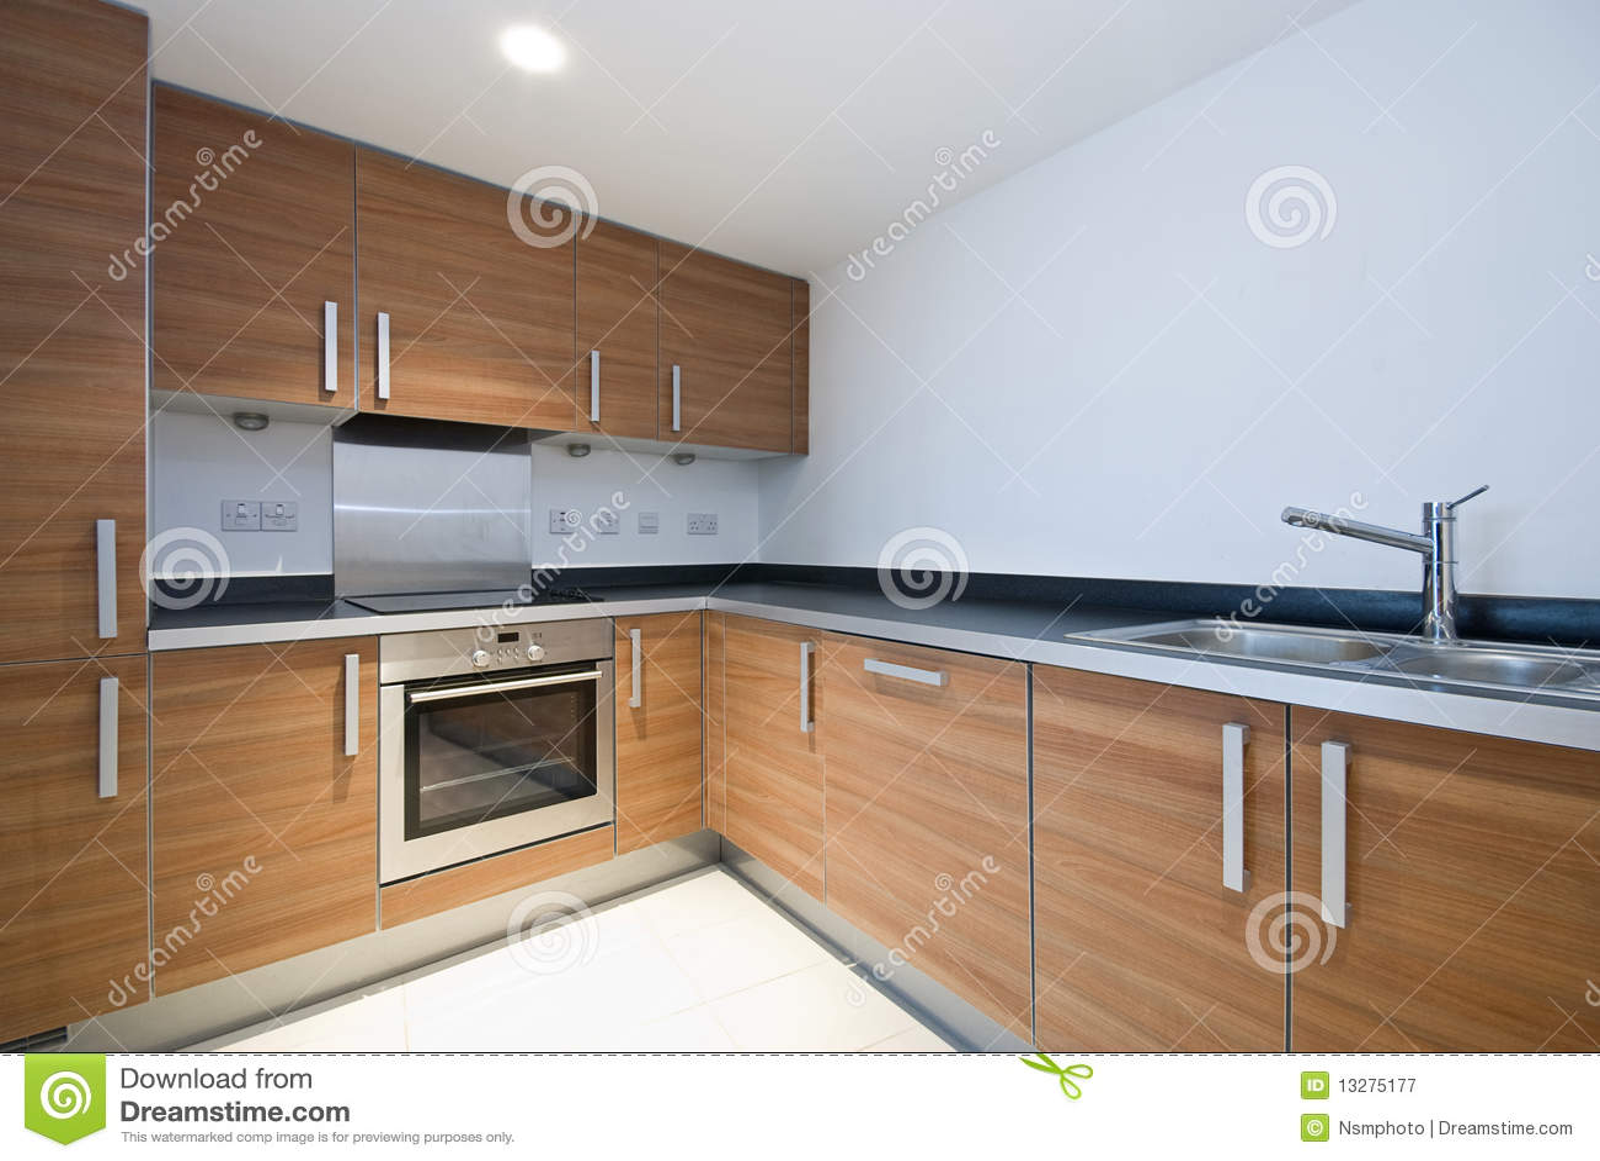 Cocina de madera moderna espaciosa con las aplicaciones - Cocinas de madera modernas ...